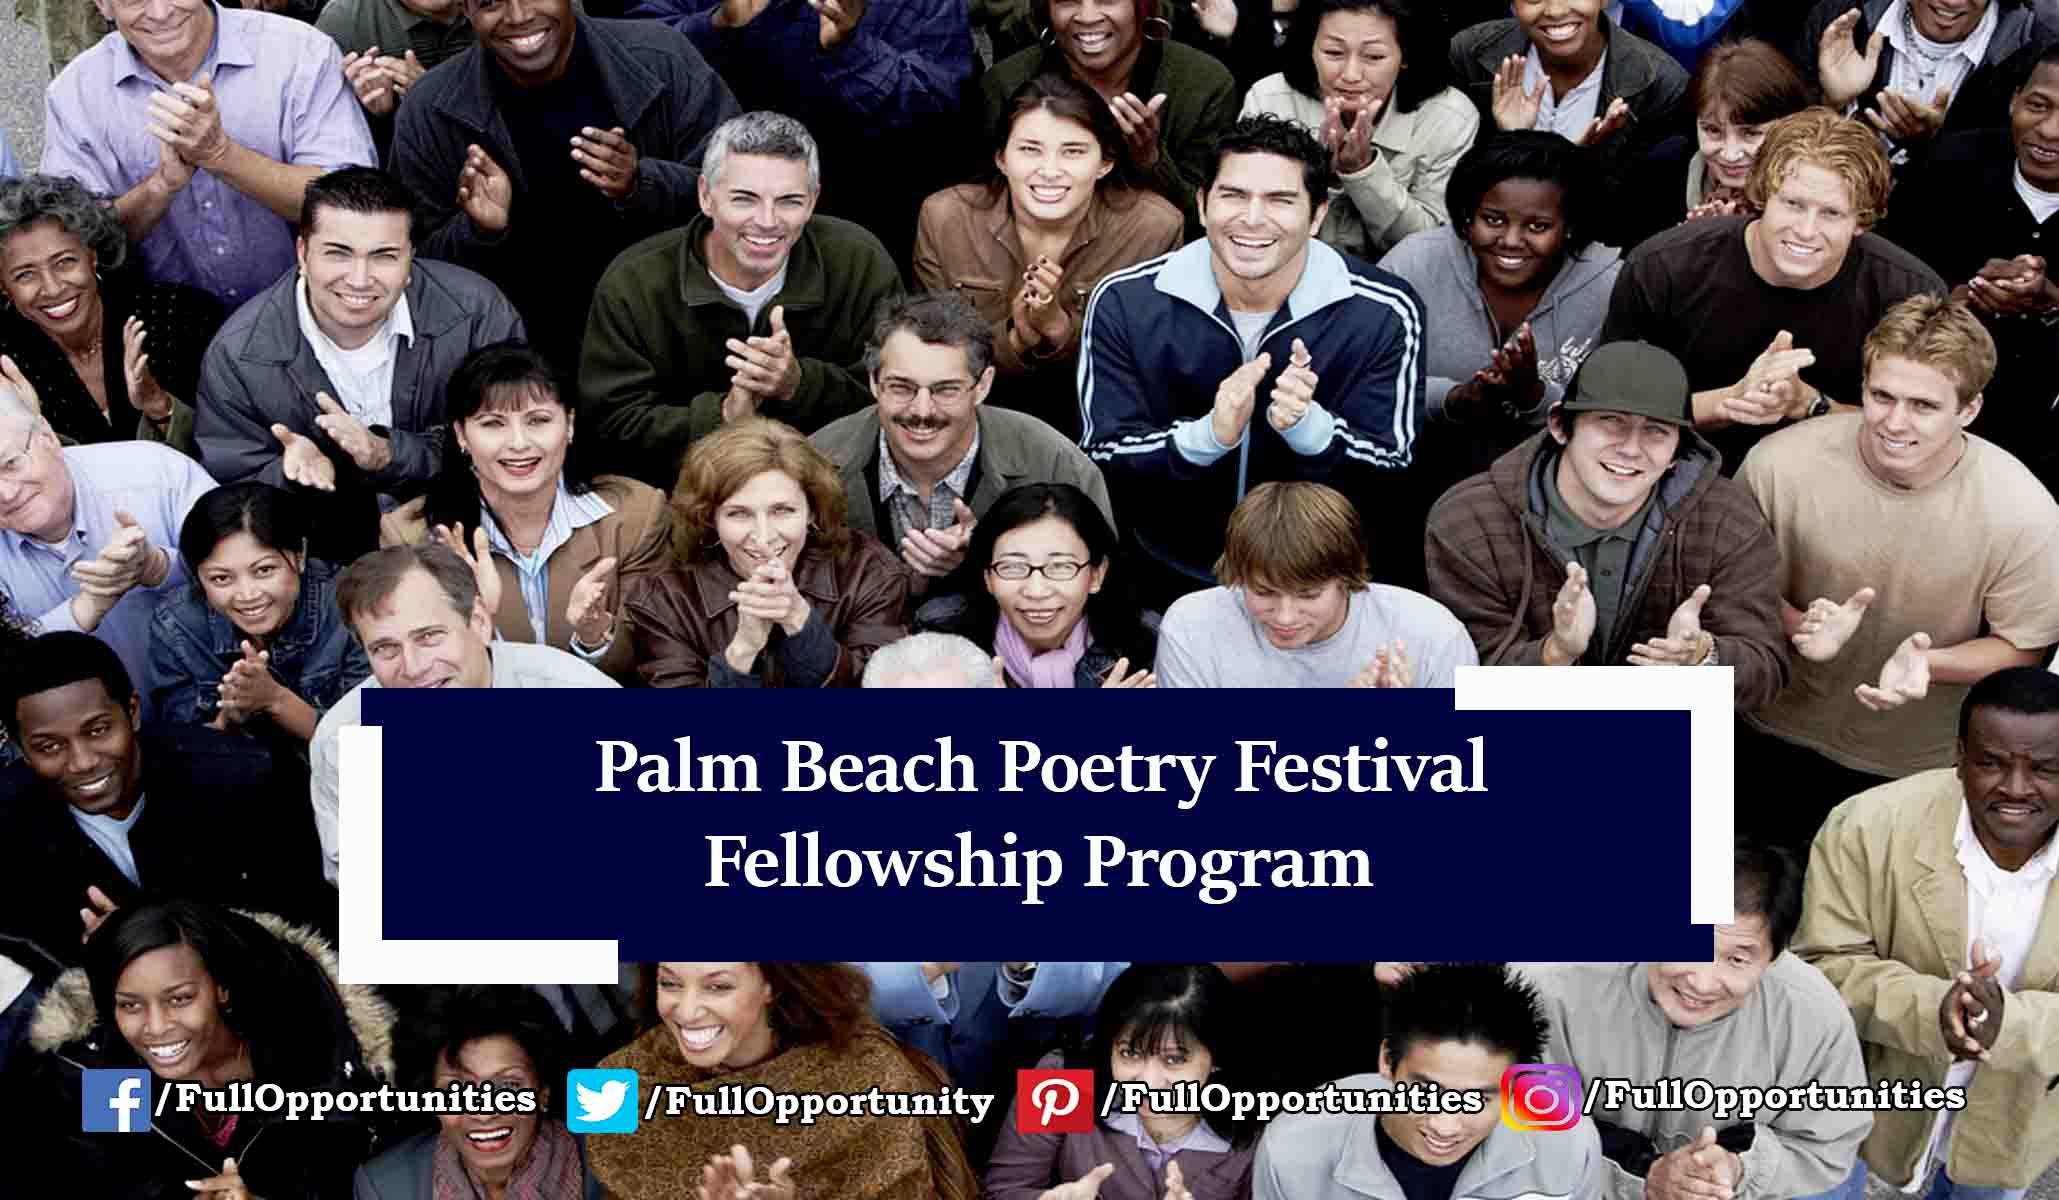 Poetry Festival 2020 Palm Beach Poetry Festival CantoMundo Fellowship 2020